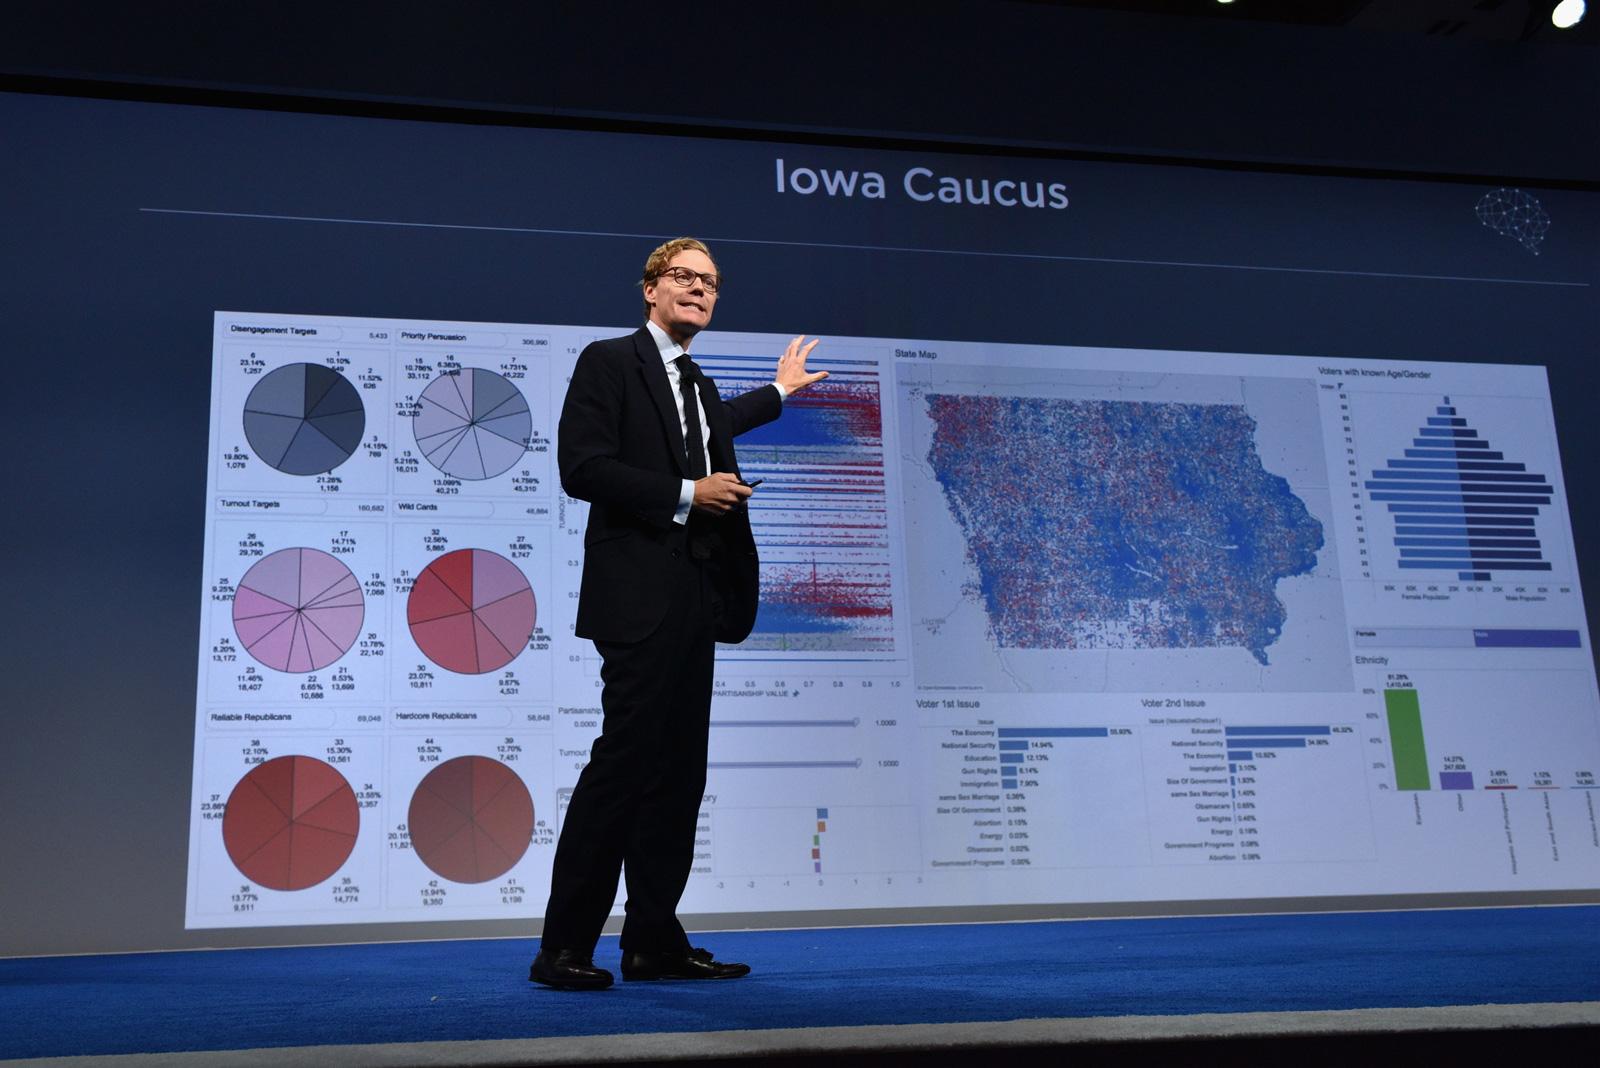 CEO of Cambridge Analytica Alexander Nix speaks at the 2016 Concordia Summit, New York City, September 19, 2016